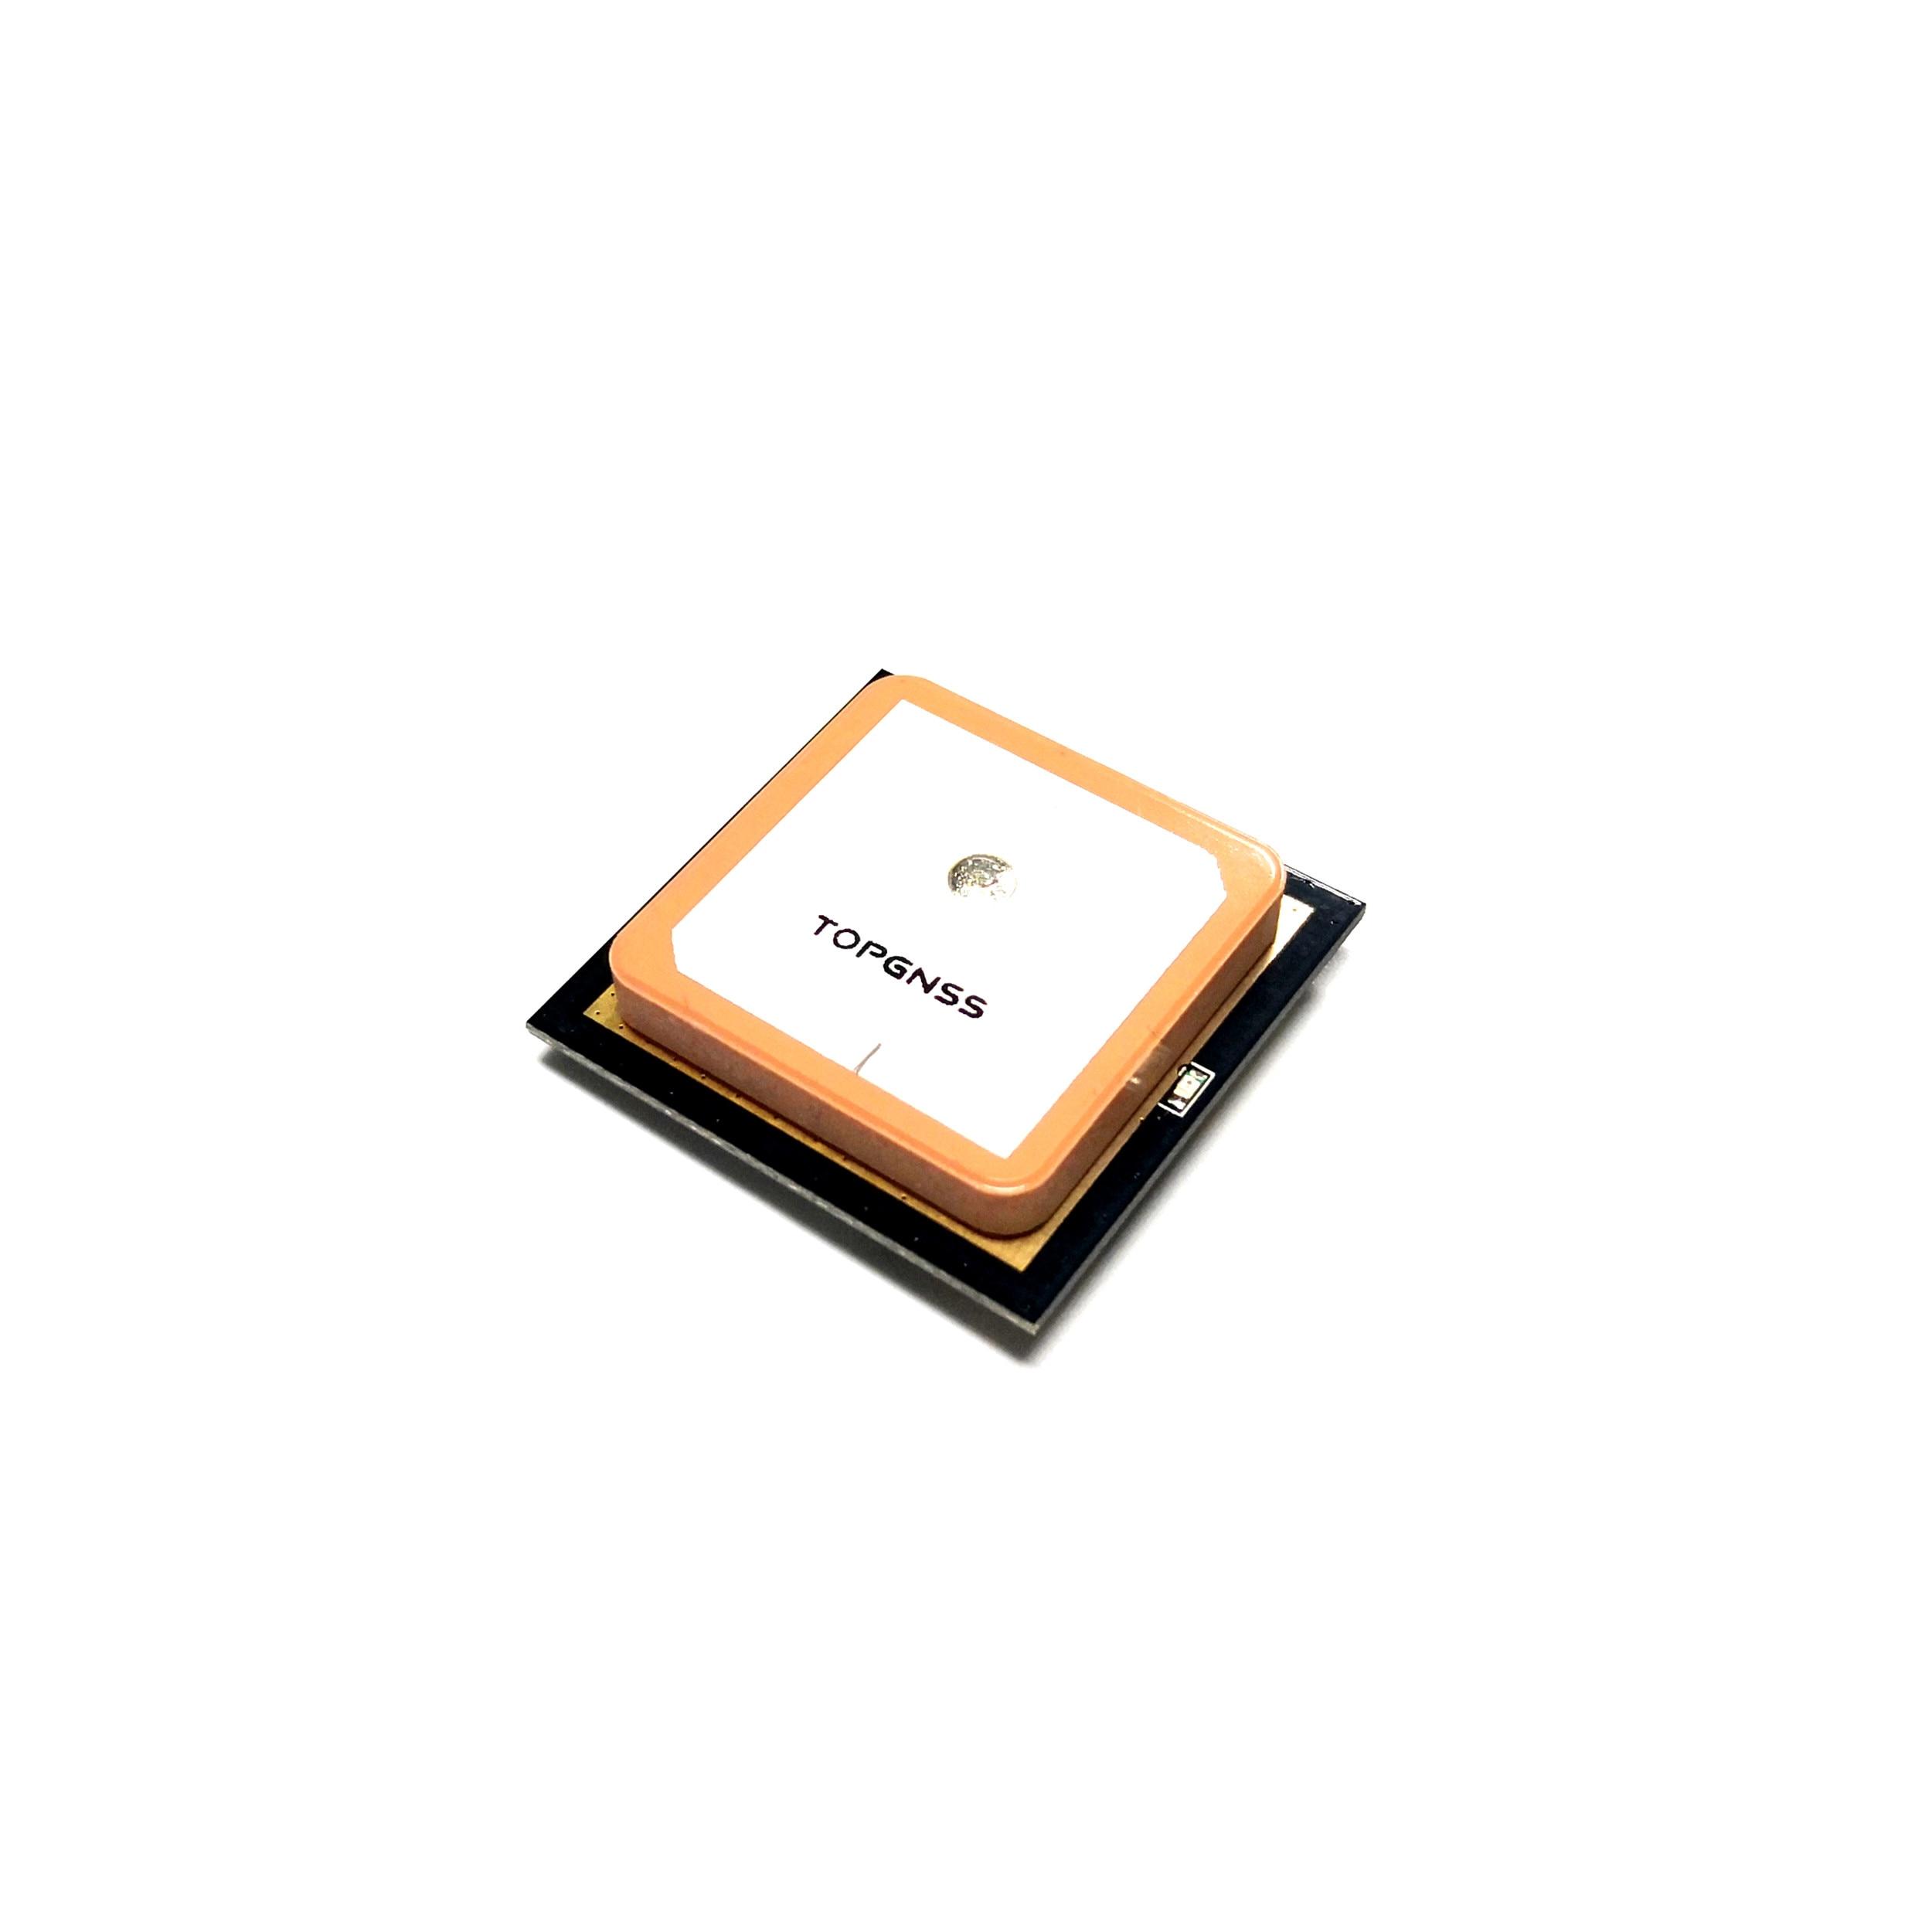 TTL UART GPS Modue GN-803 GPS GLONASS GALILEO GNSS Mode M8n GNSS Module Antenna Receiver Built-in FLASH NMEA0183 FW3.01 TOPGNSS